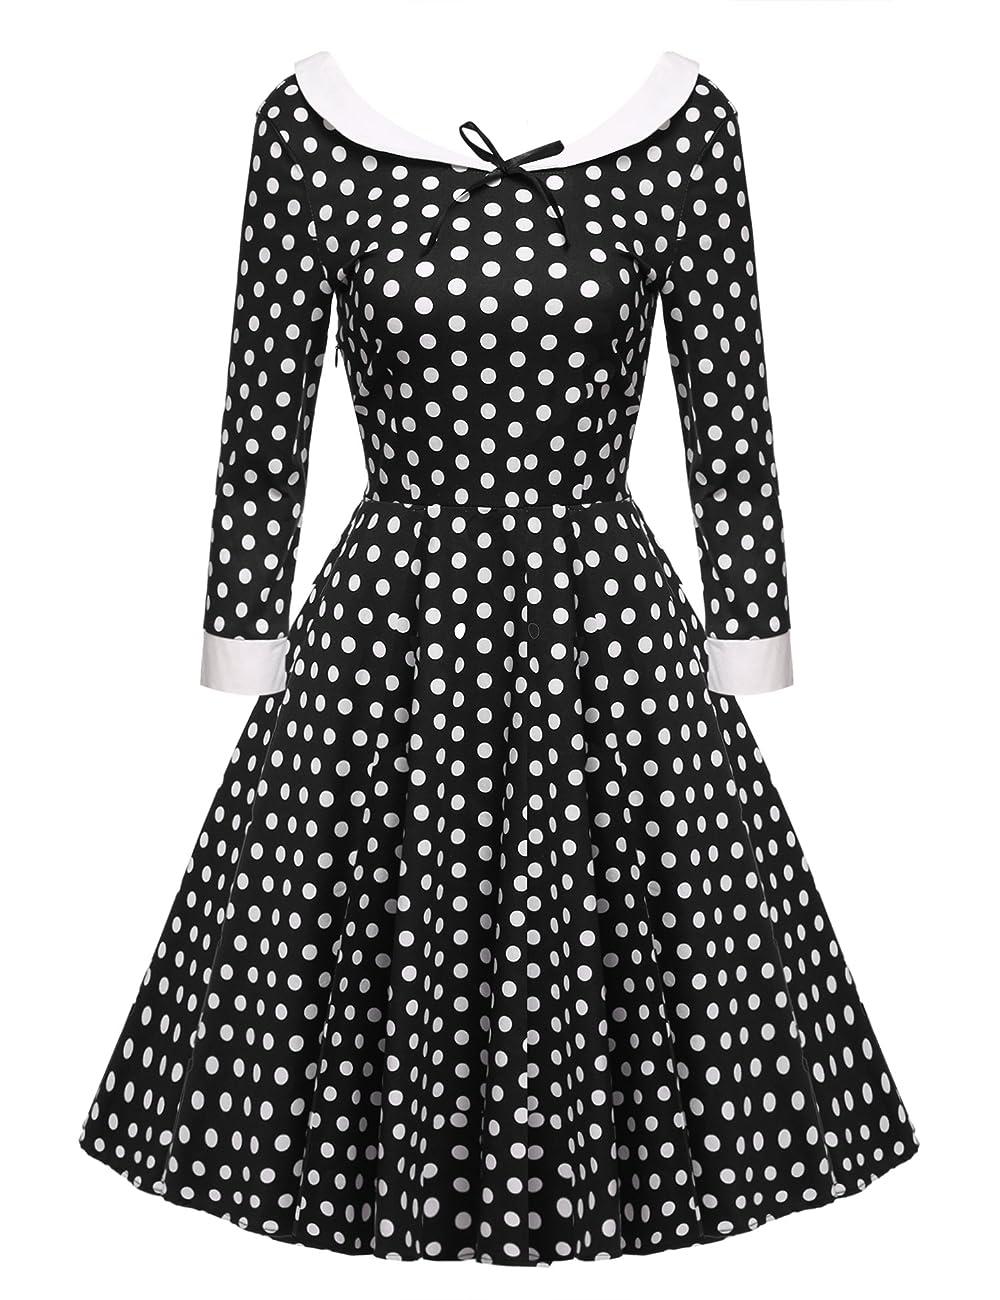 ACEVOG Women's Vintage 50s Elegant Polka Dot Formal Casual Party Dress 0